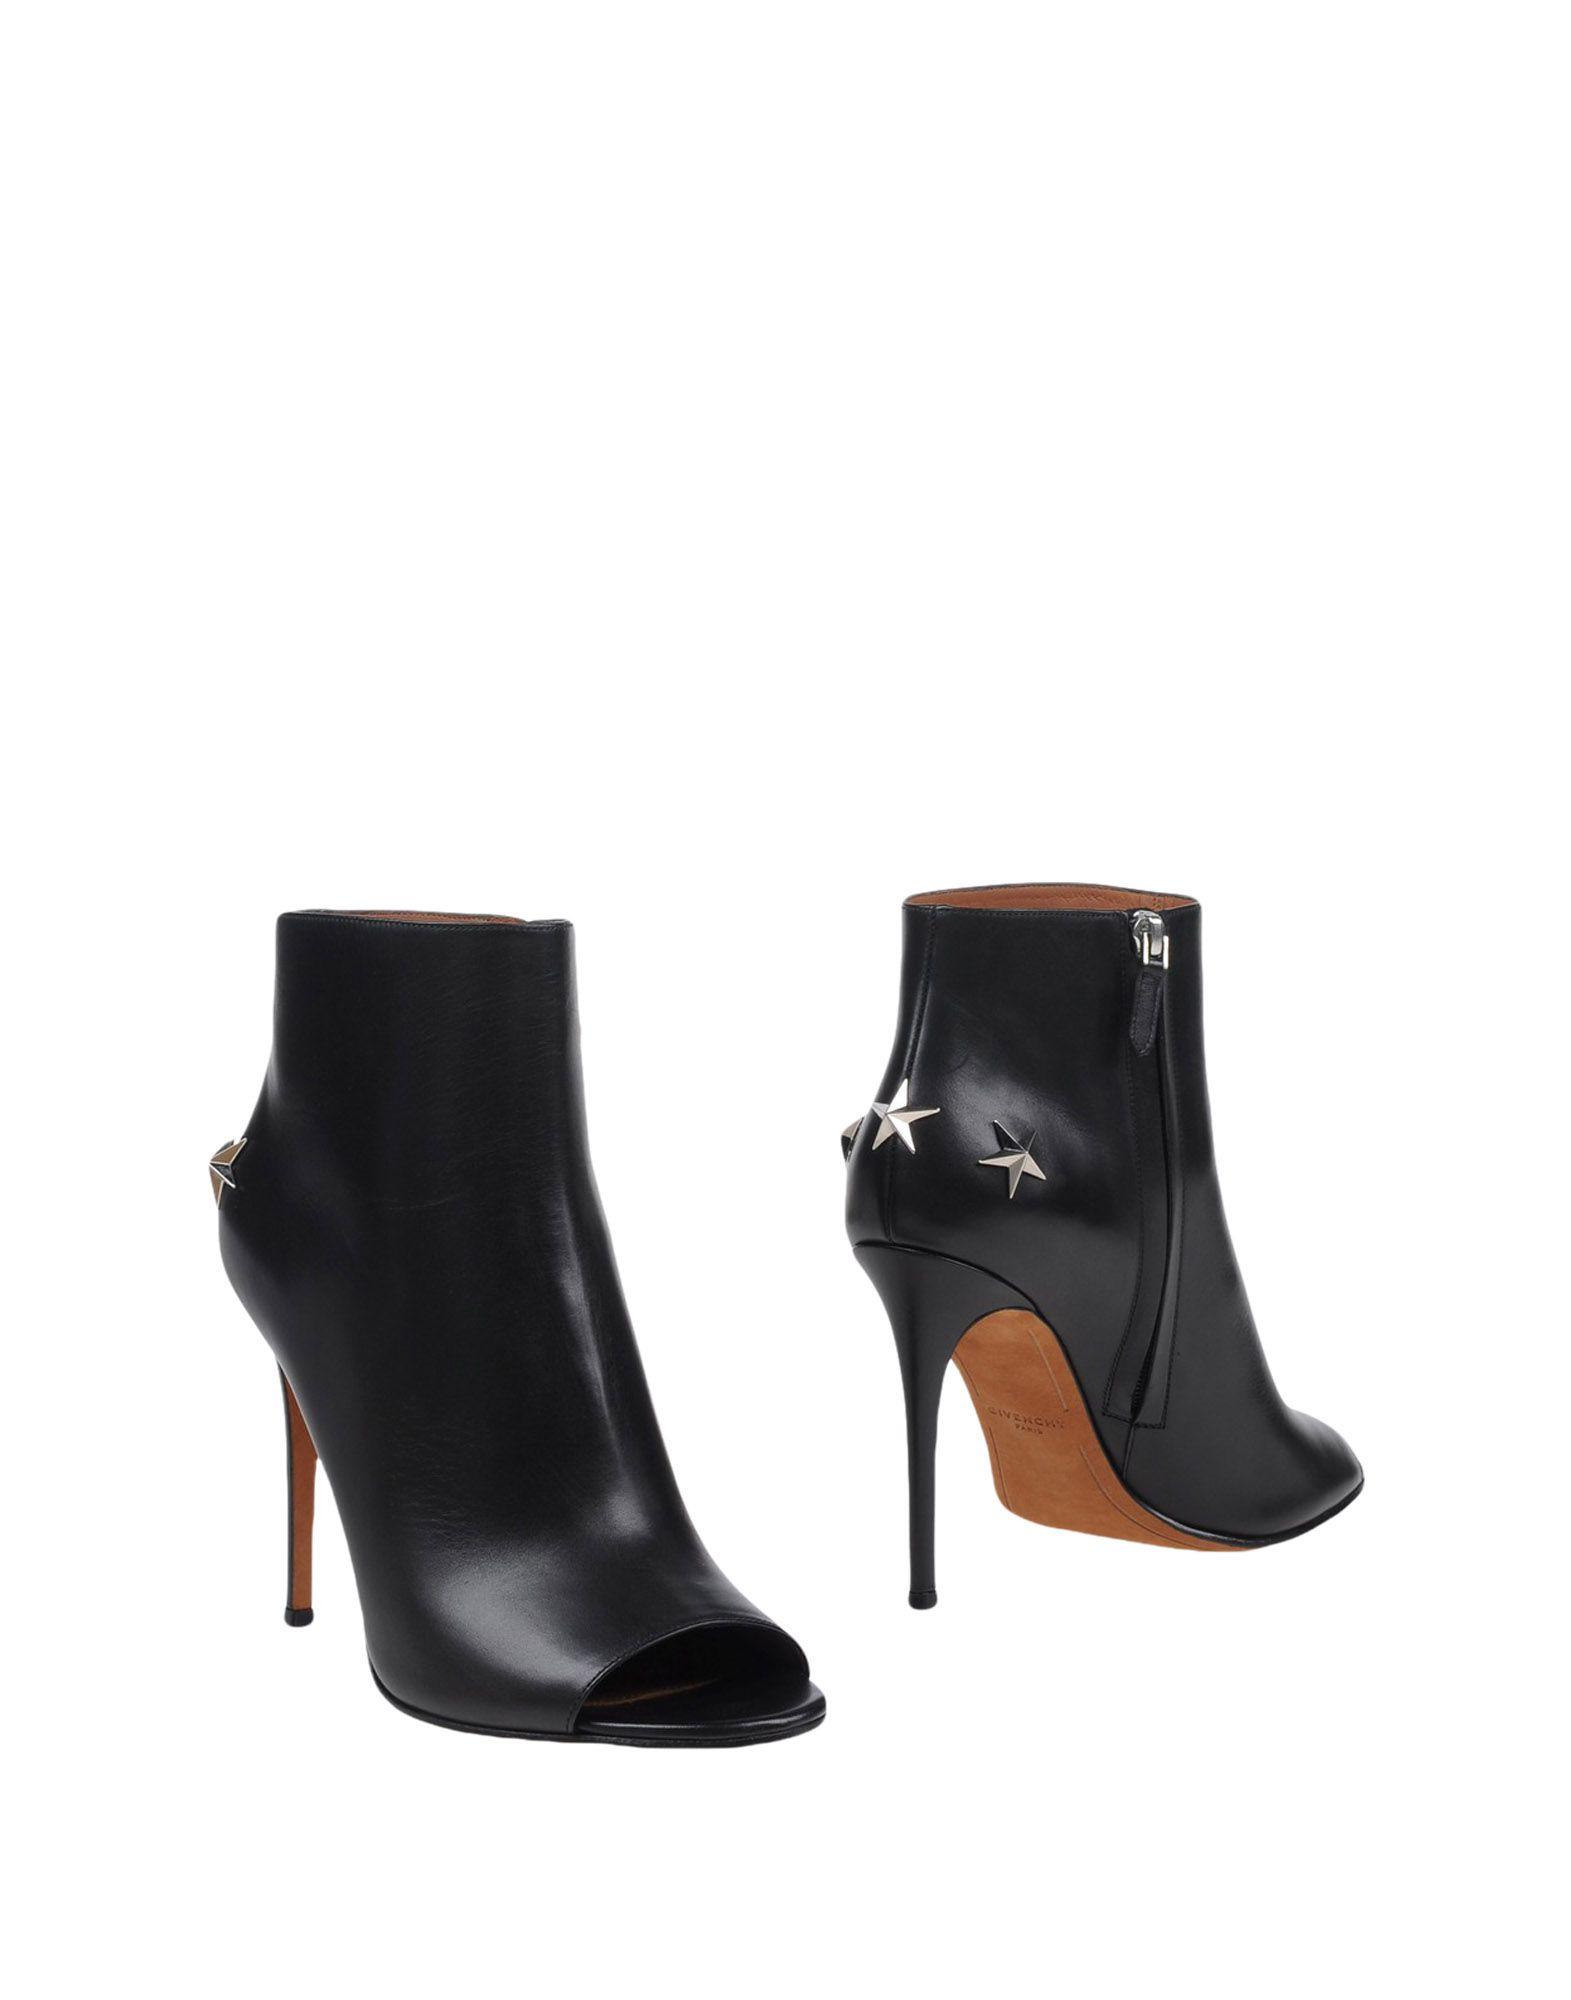 GIVENCHY Полусапоги и высокие ботинки ambitious полусапоги и высокие ботинки